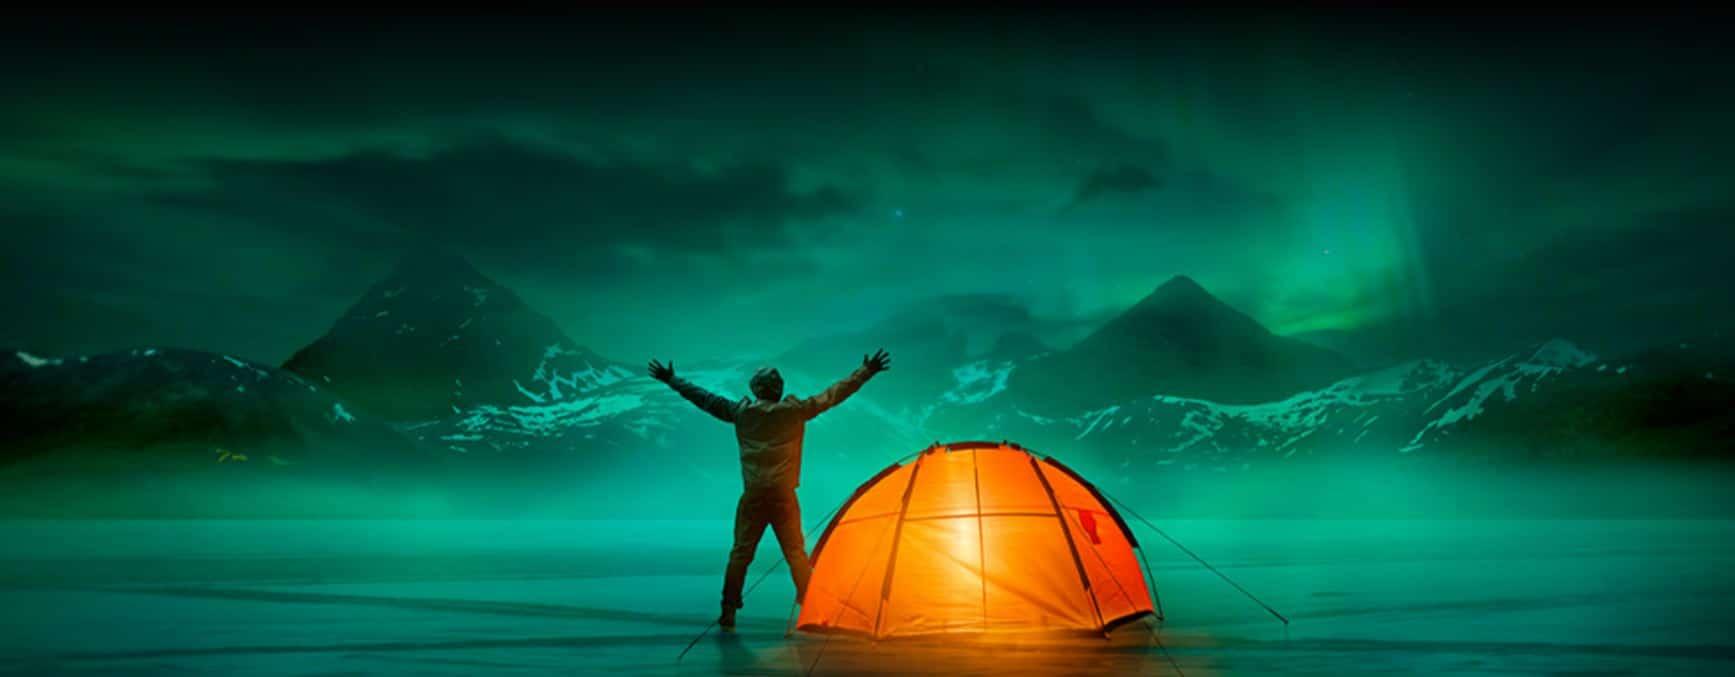 rapaz com tenda laranja ve as auroras boreais